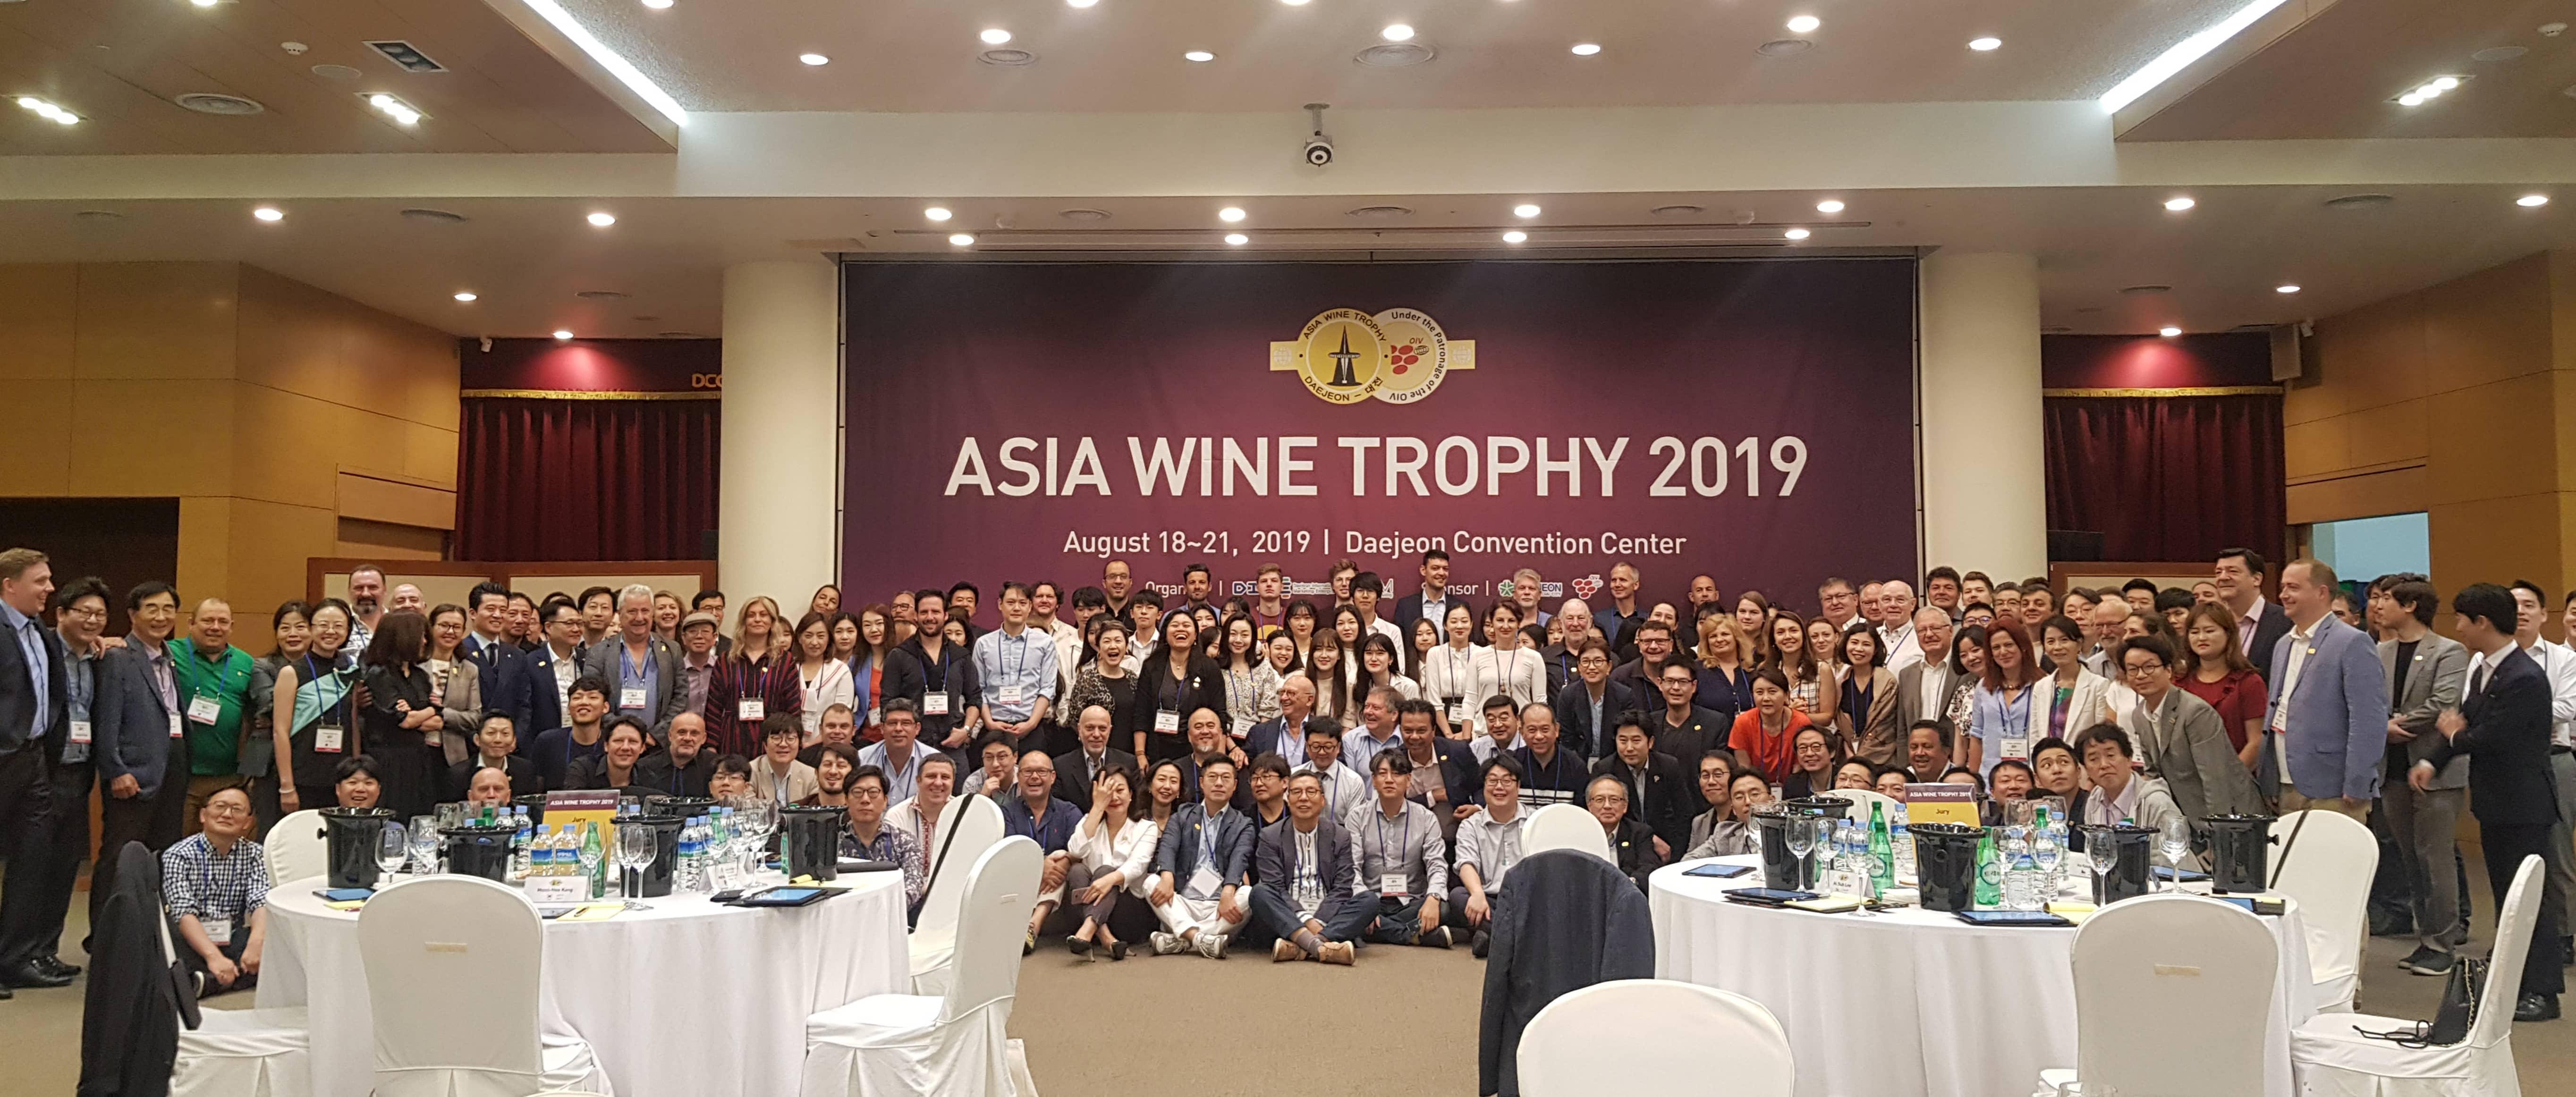 Asia Wine Trophy 2